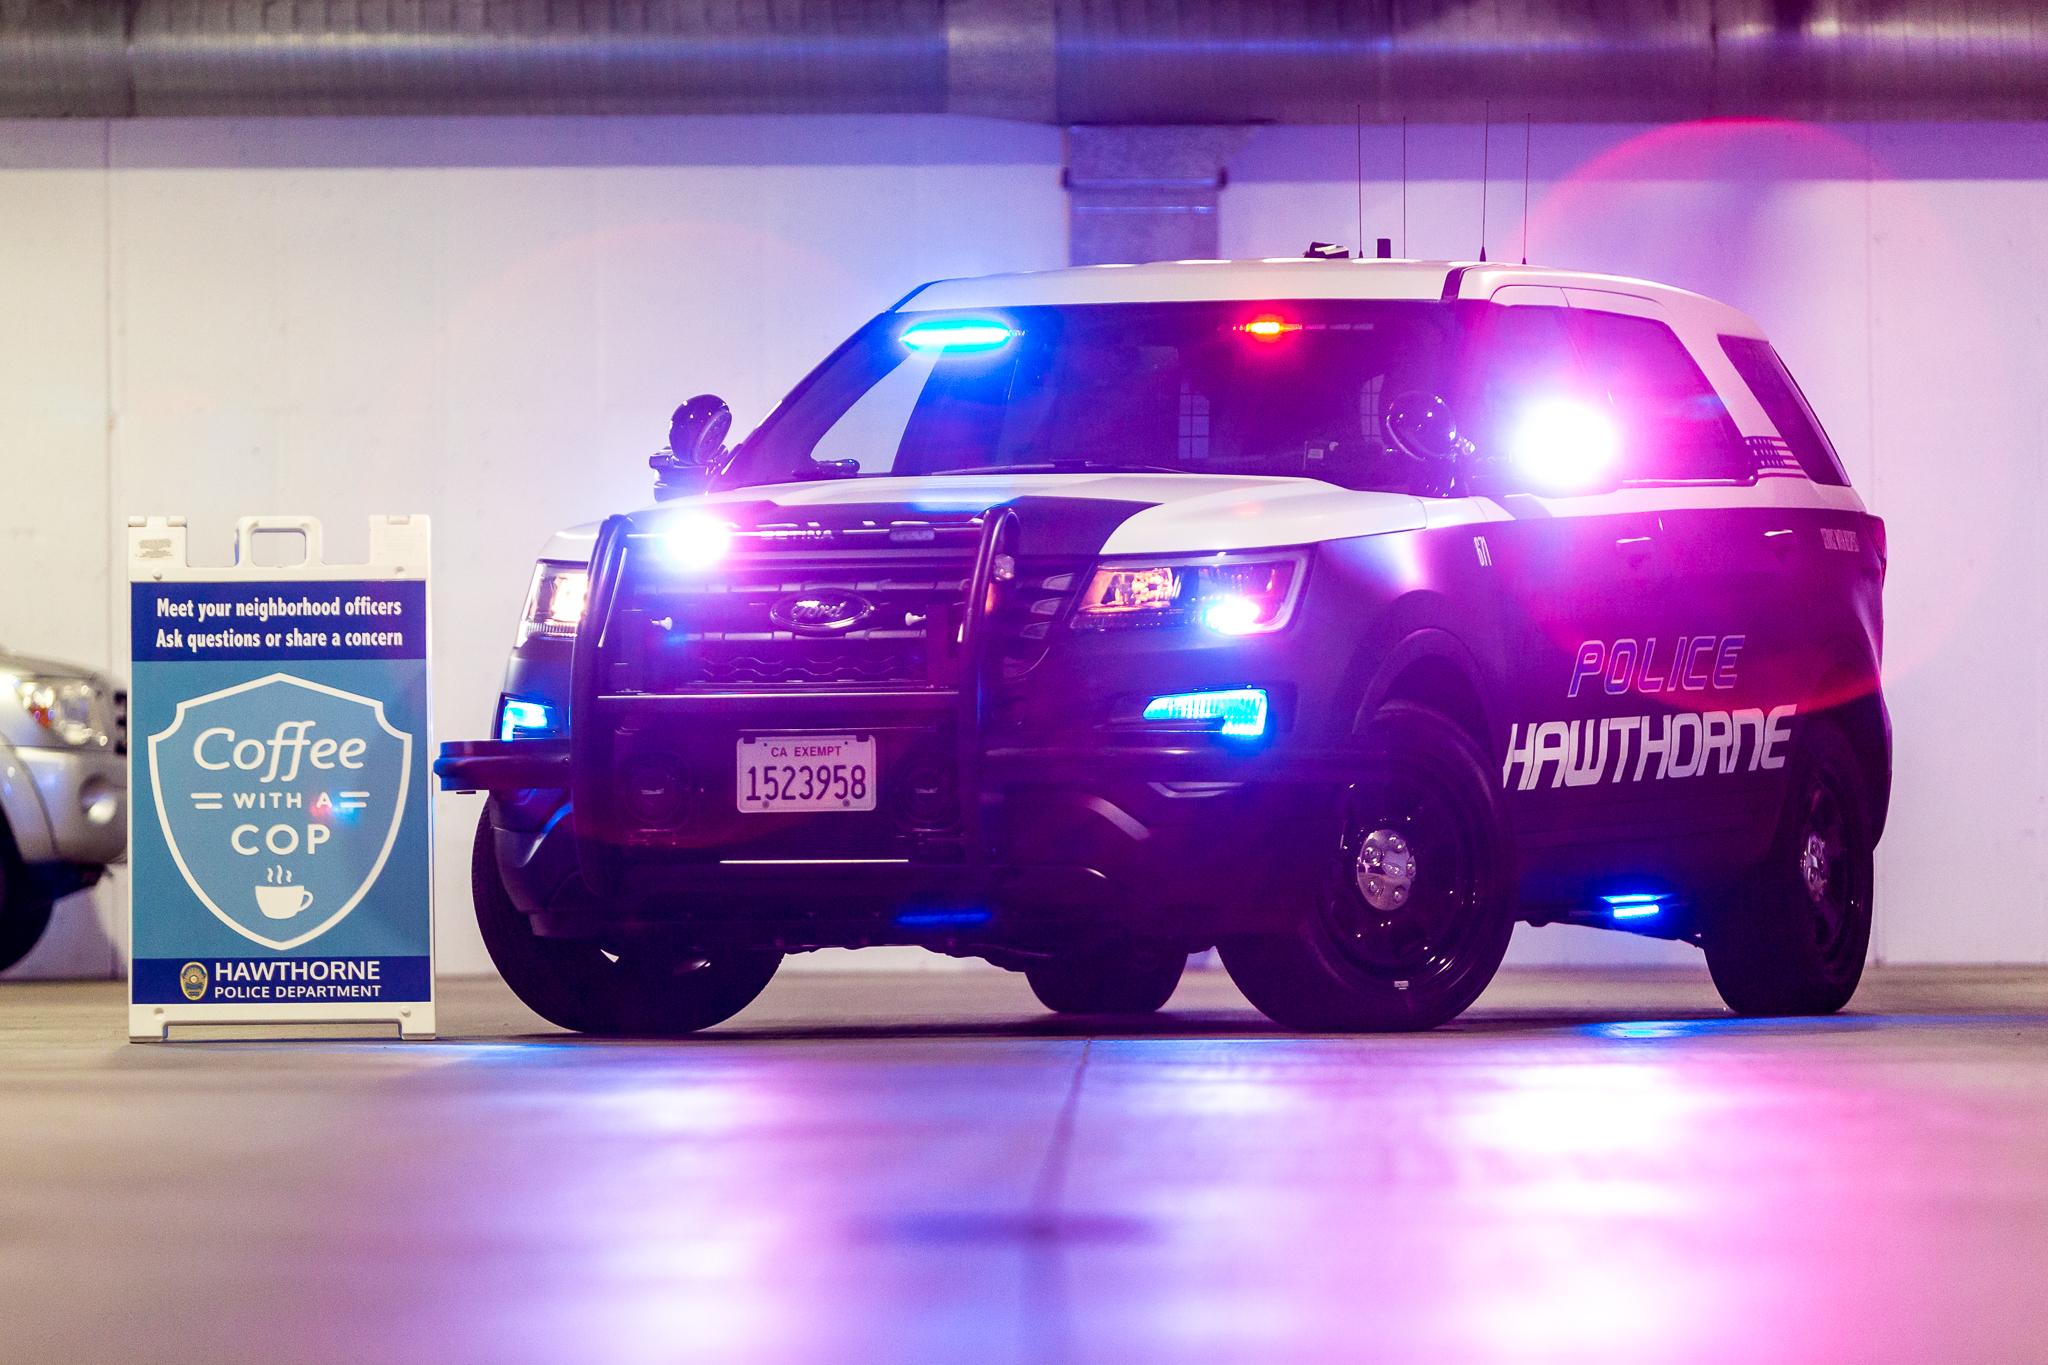 Patrol Vehicle — Hawthorne police